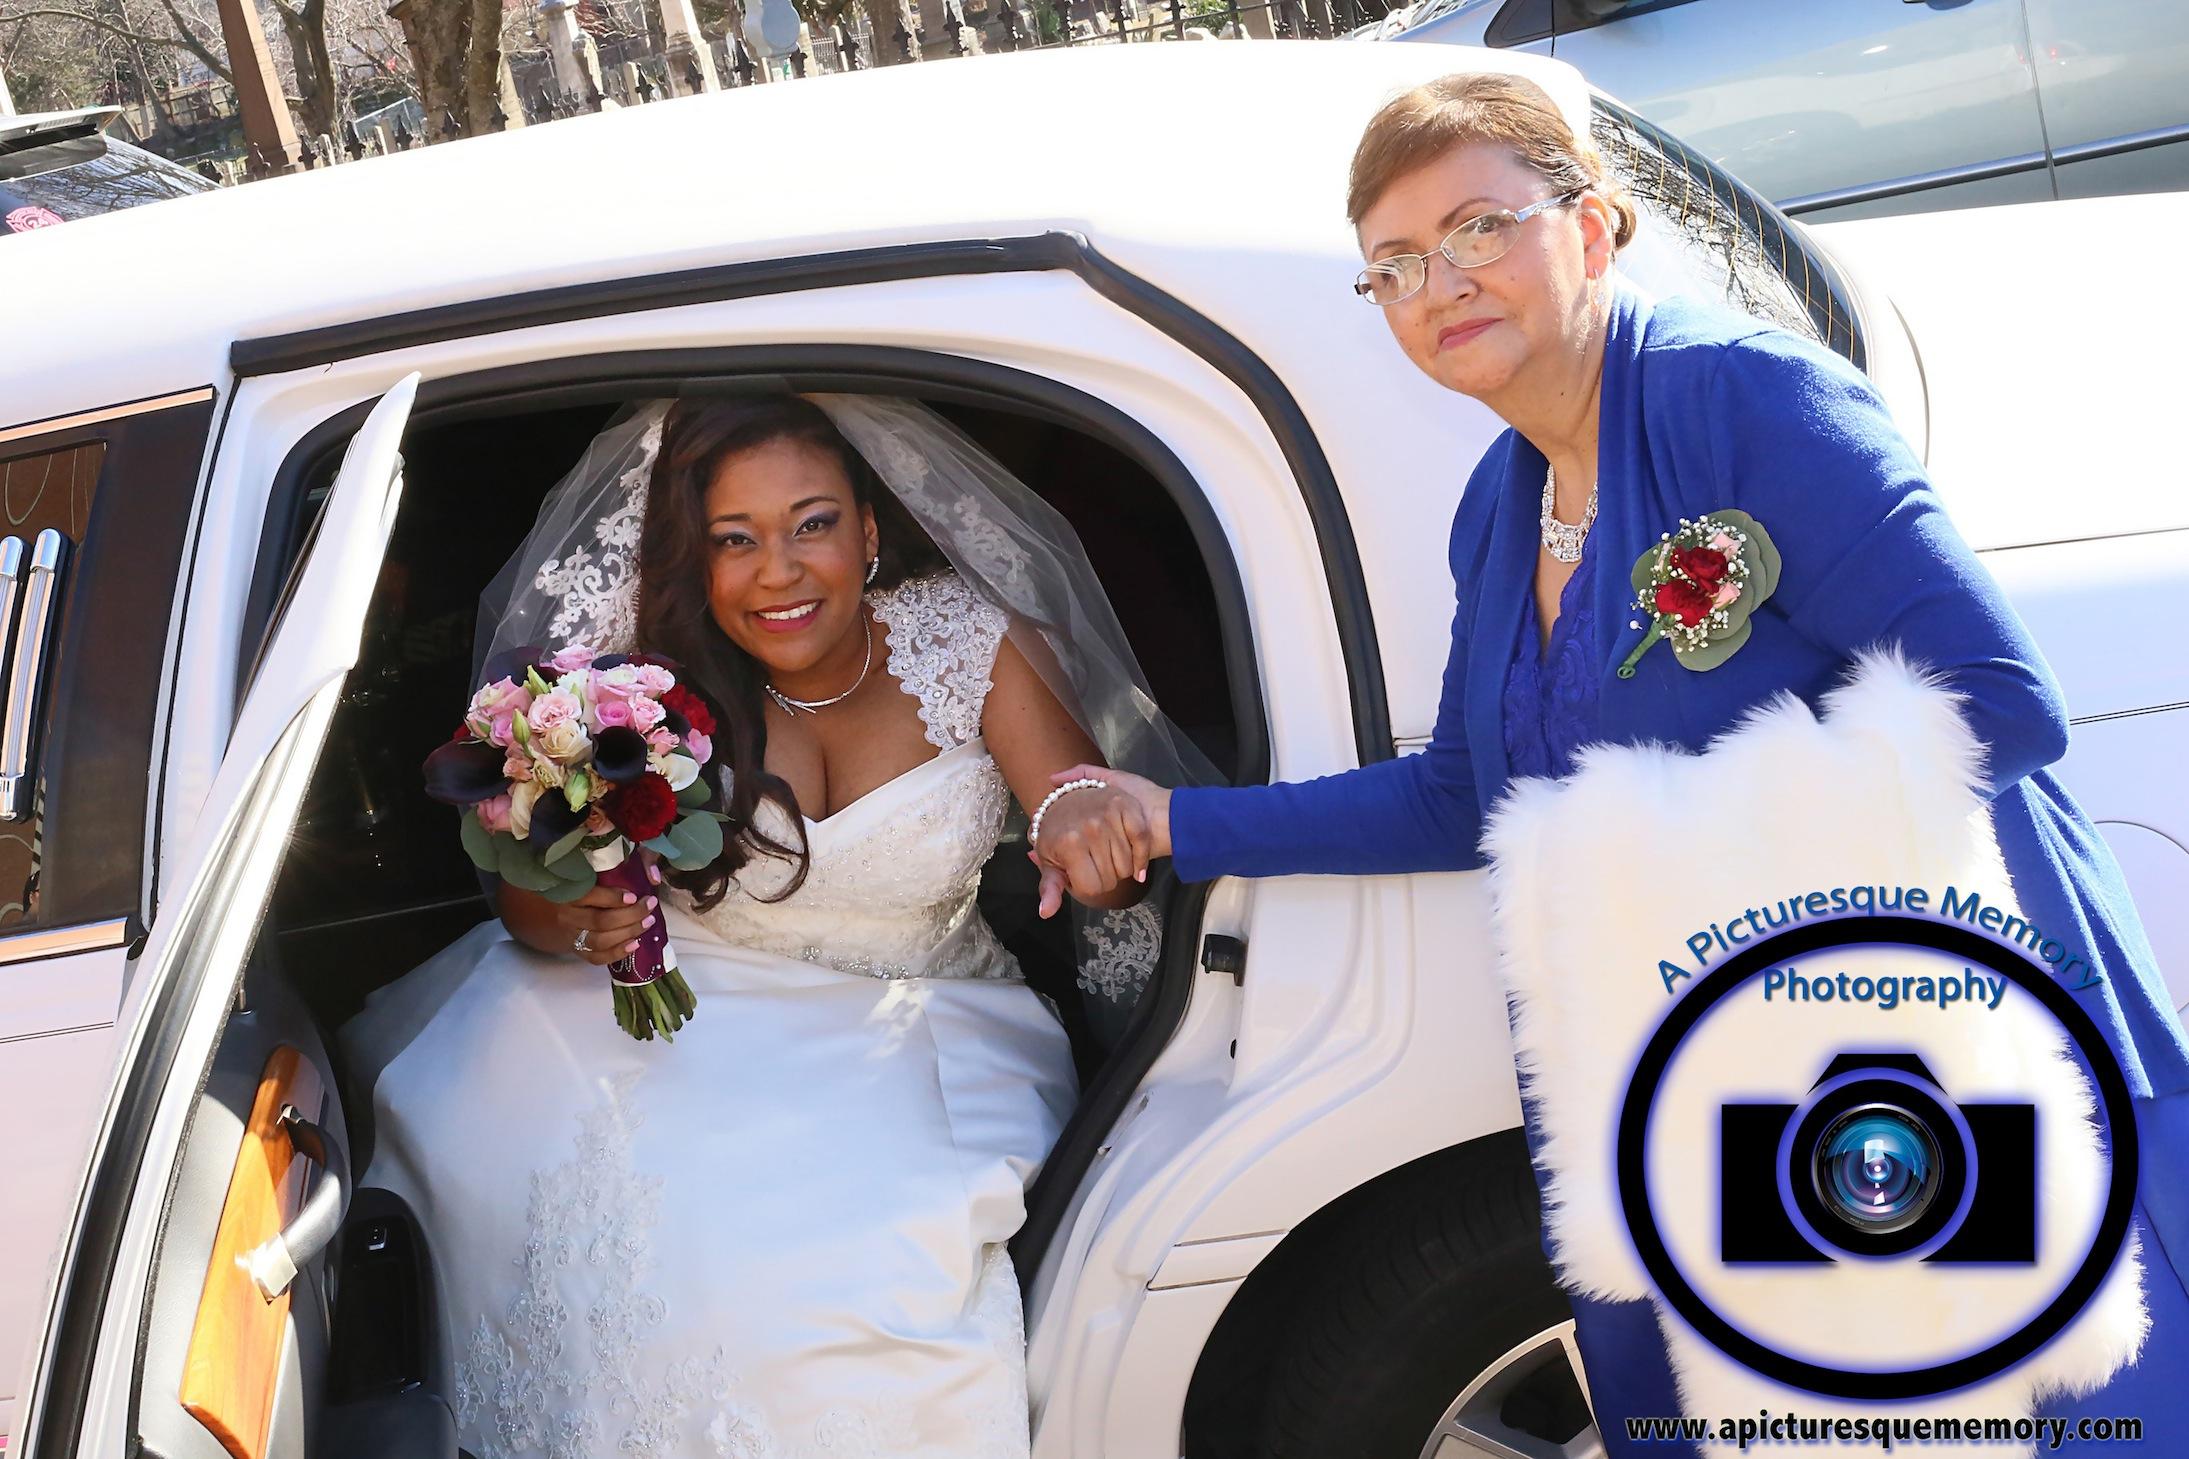 #njwedding, #njweddingphotography, #northbrunswickweddingphotographer#weddingphotos, #apicturesquememoryphotography, #bride, #limo, #bridesbouquet